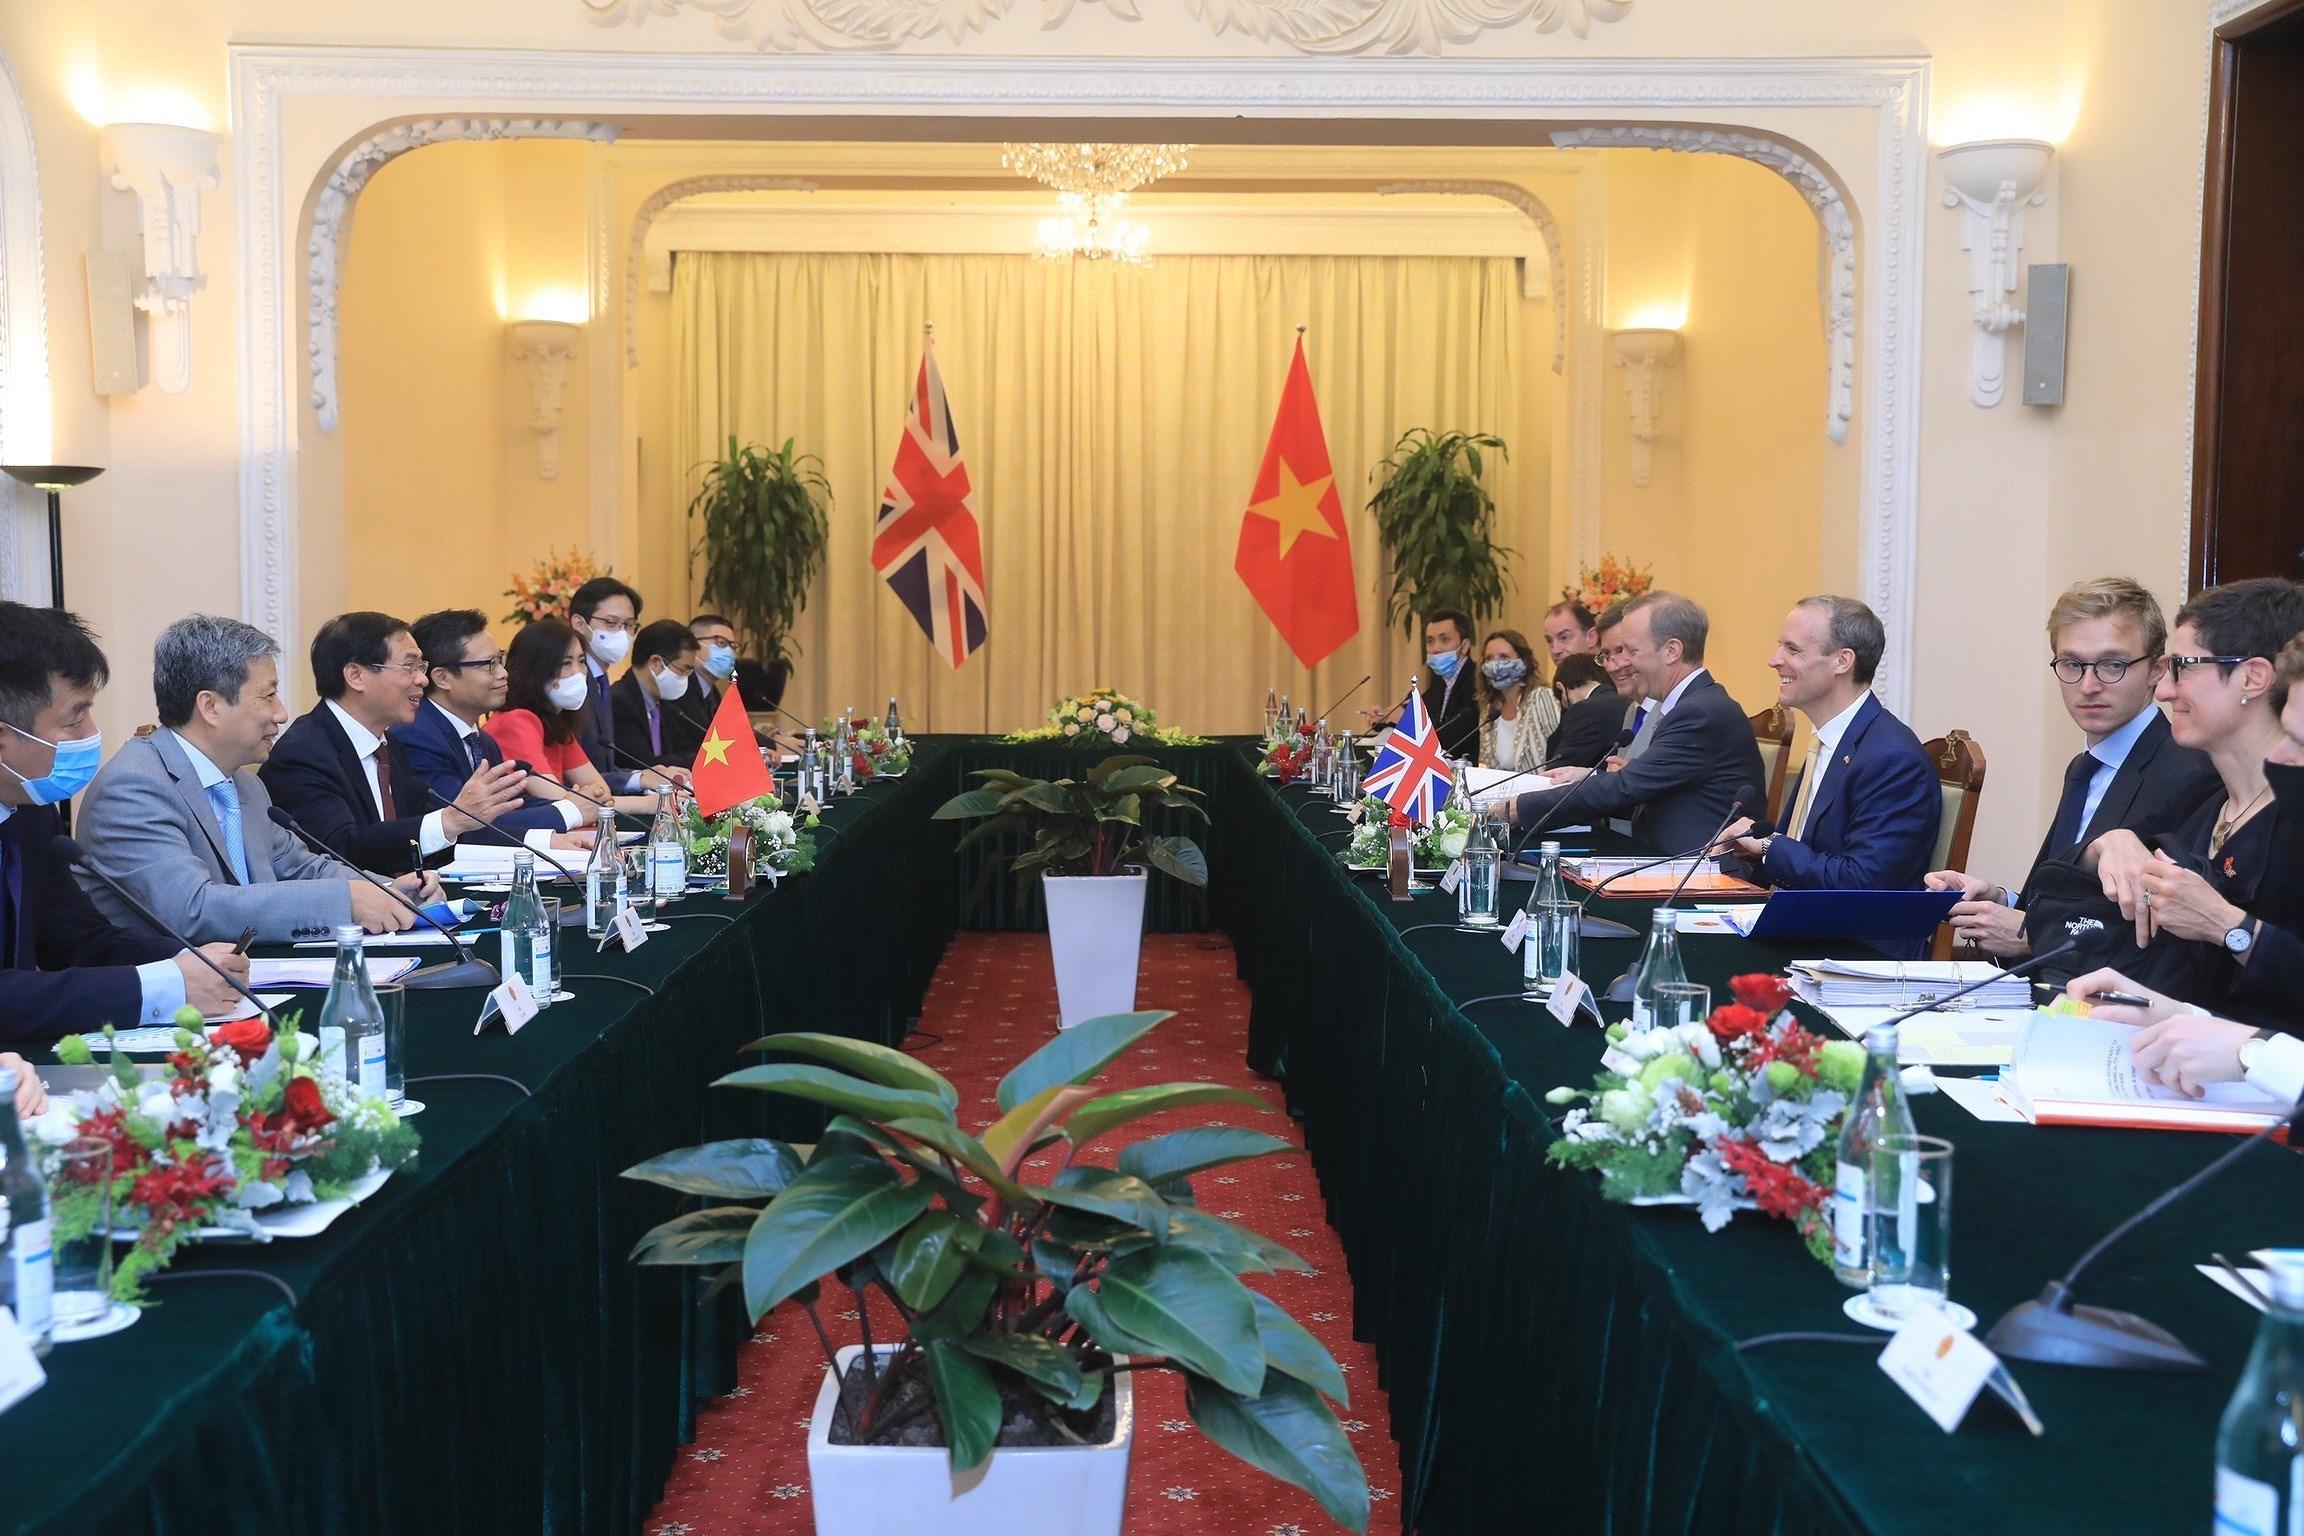 Top diplomats of Vietnam, UK hold talks in Hanoi hinh anh 2